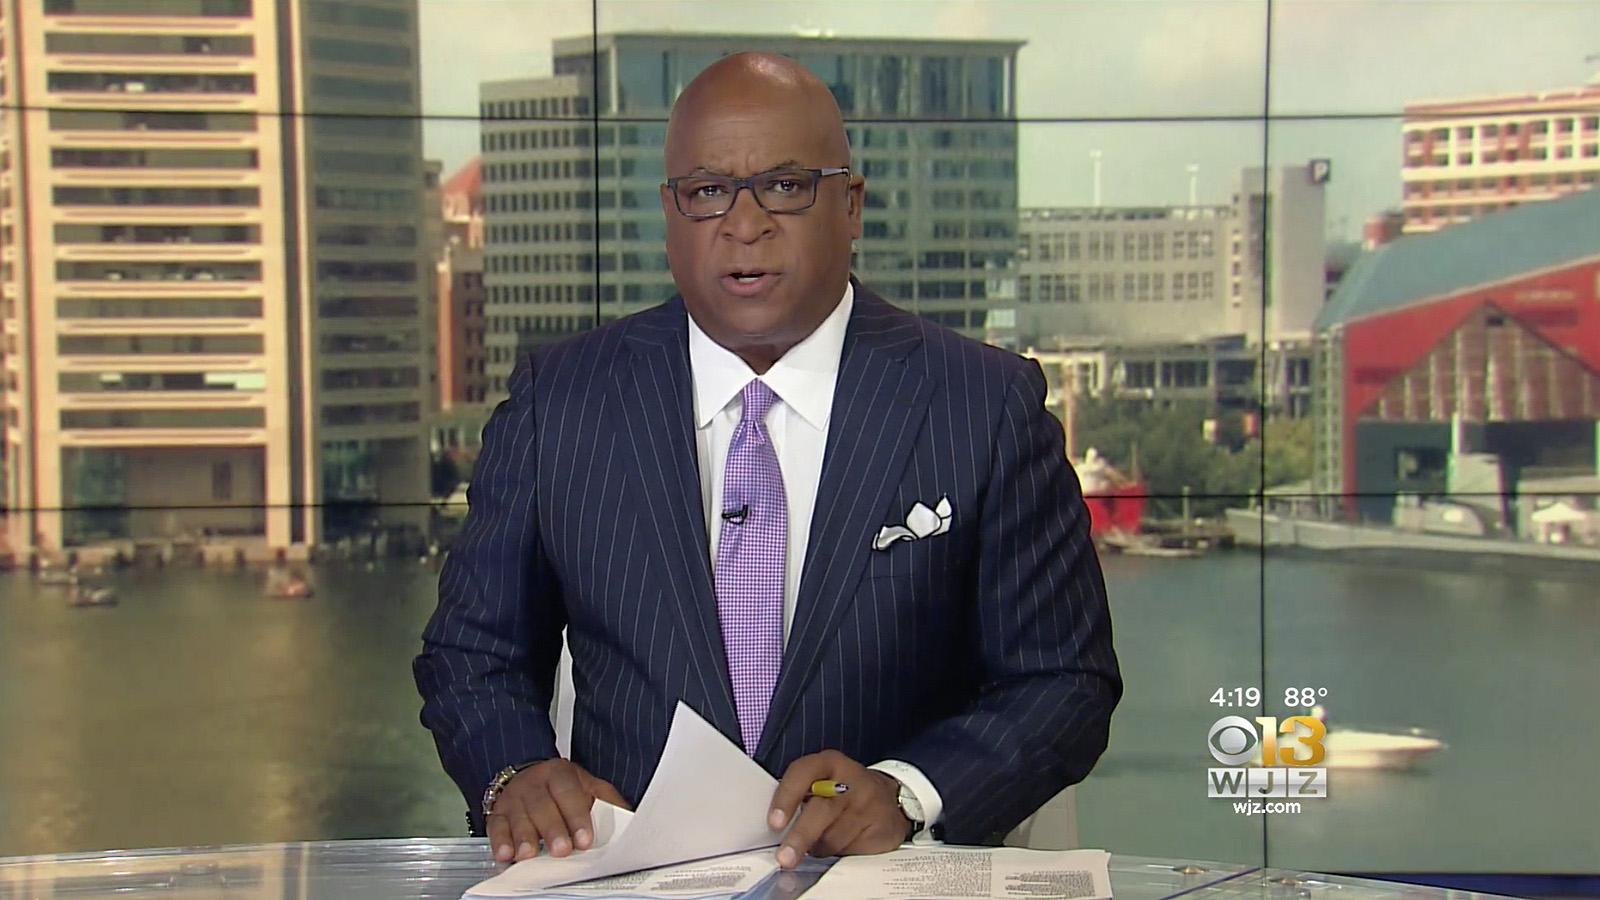 ncs_WJZ-CBS-13-Baltimore-TV-Studio_0014